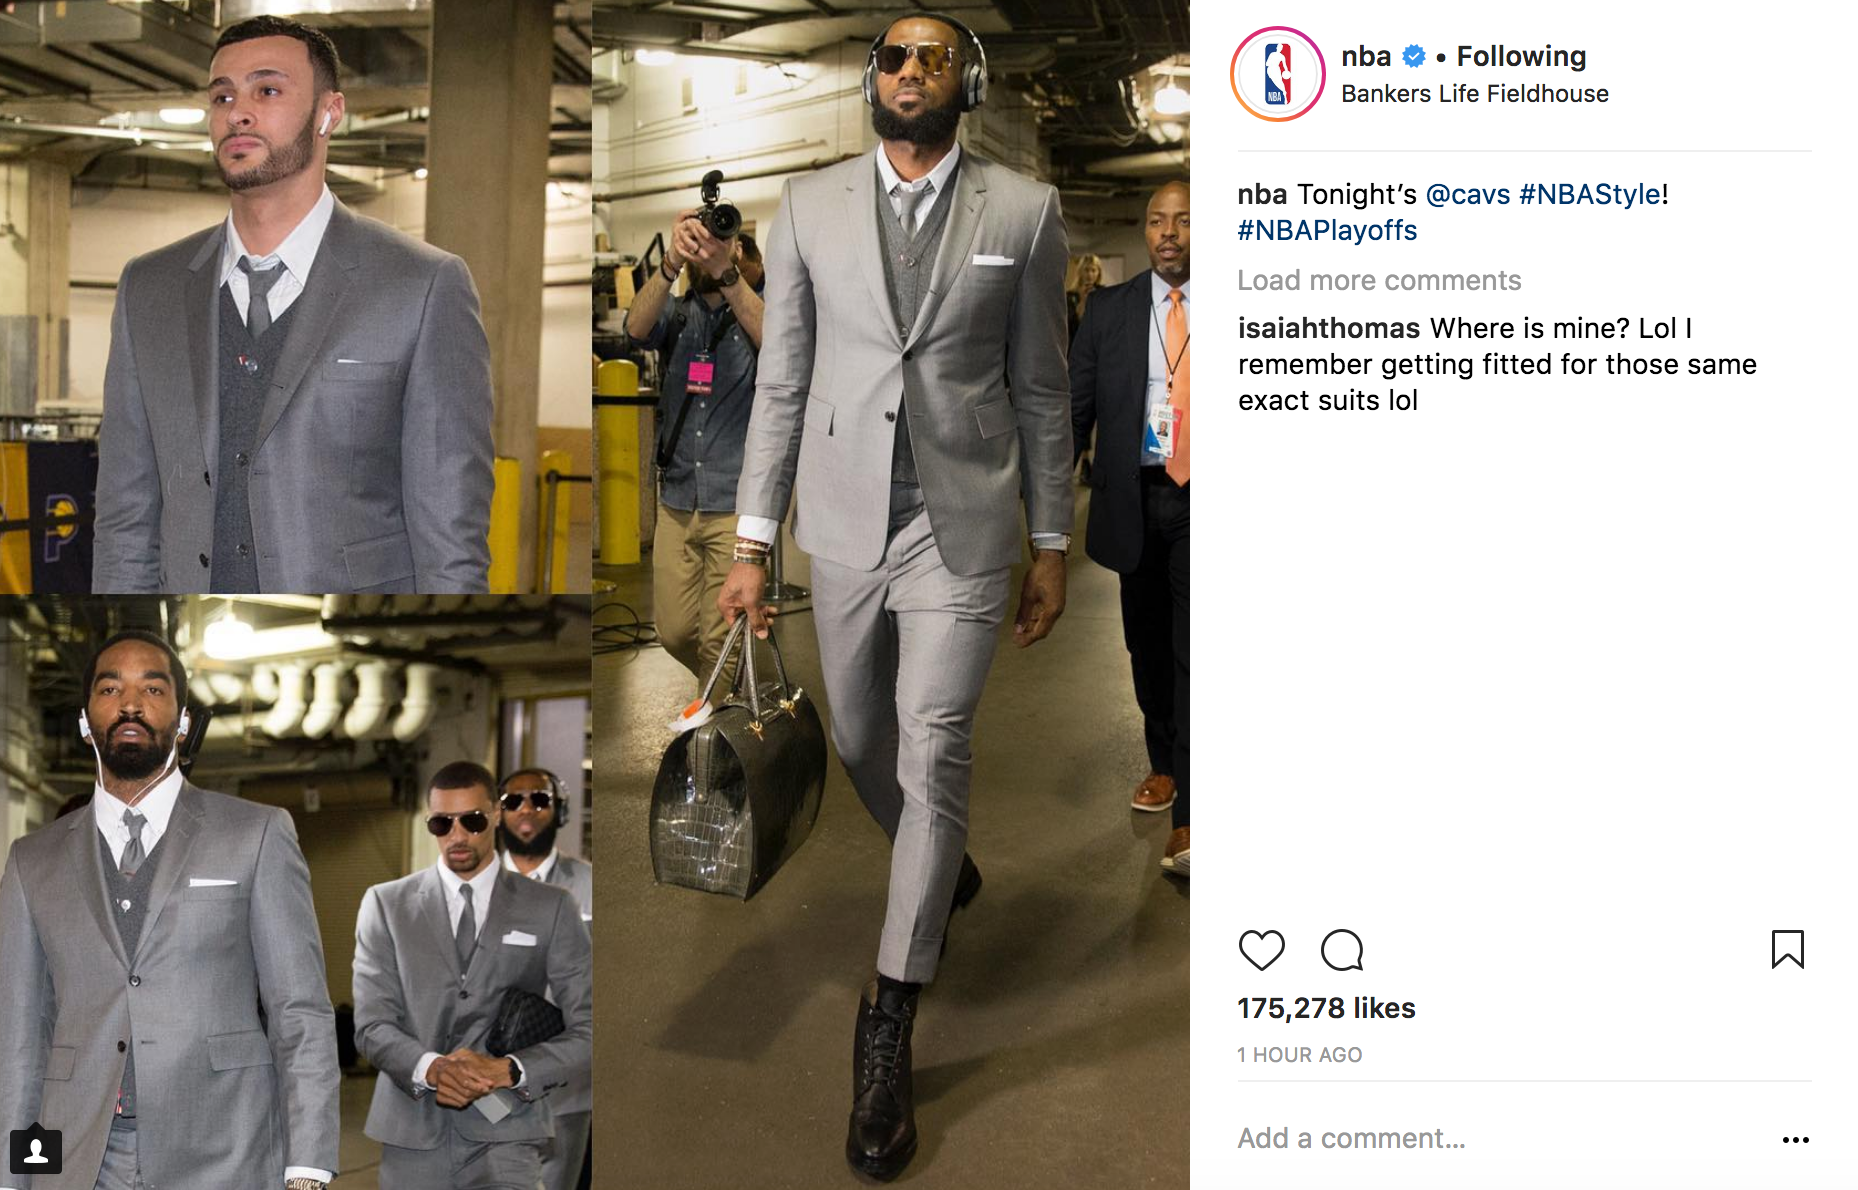 Isaiah Thomas on Cavaliers suits